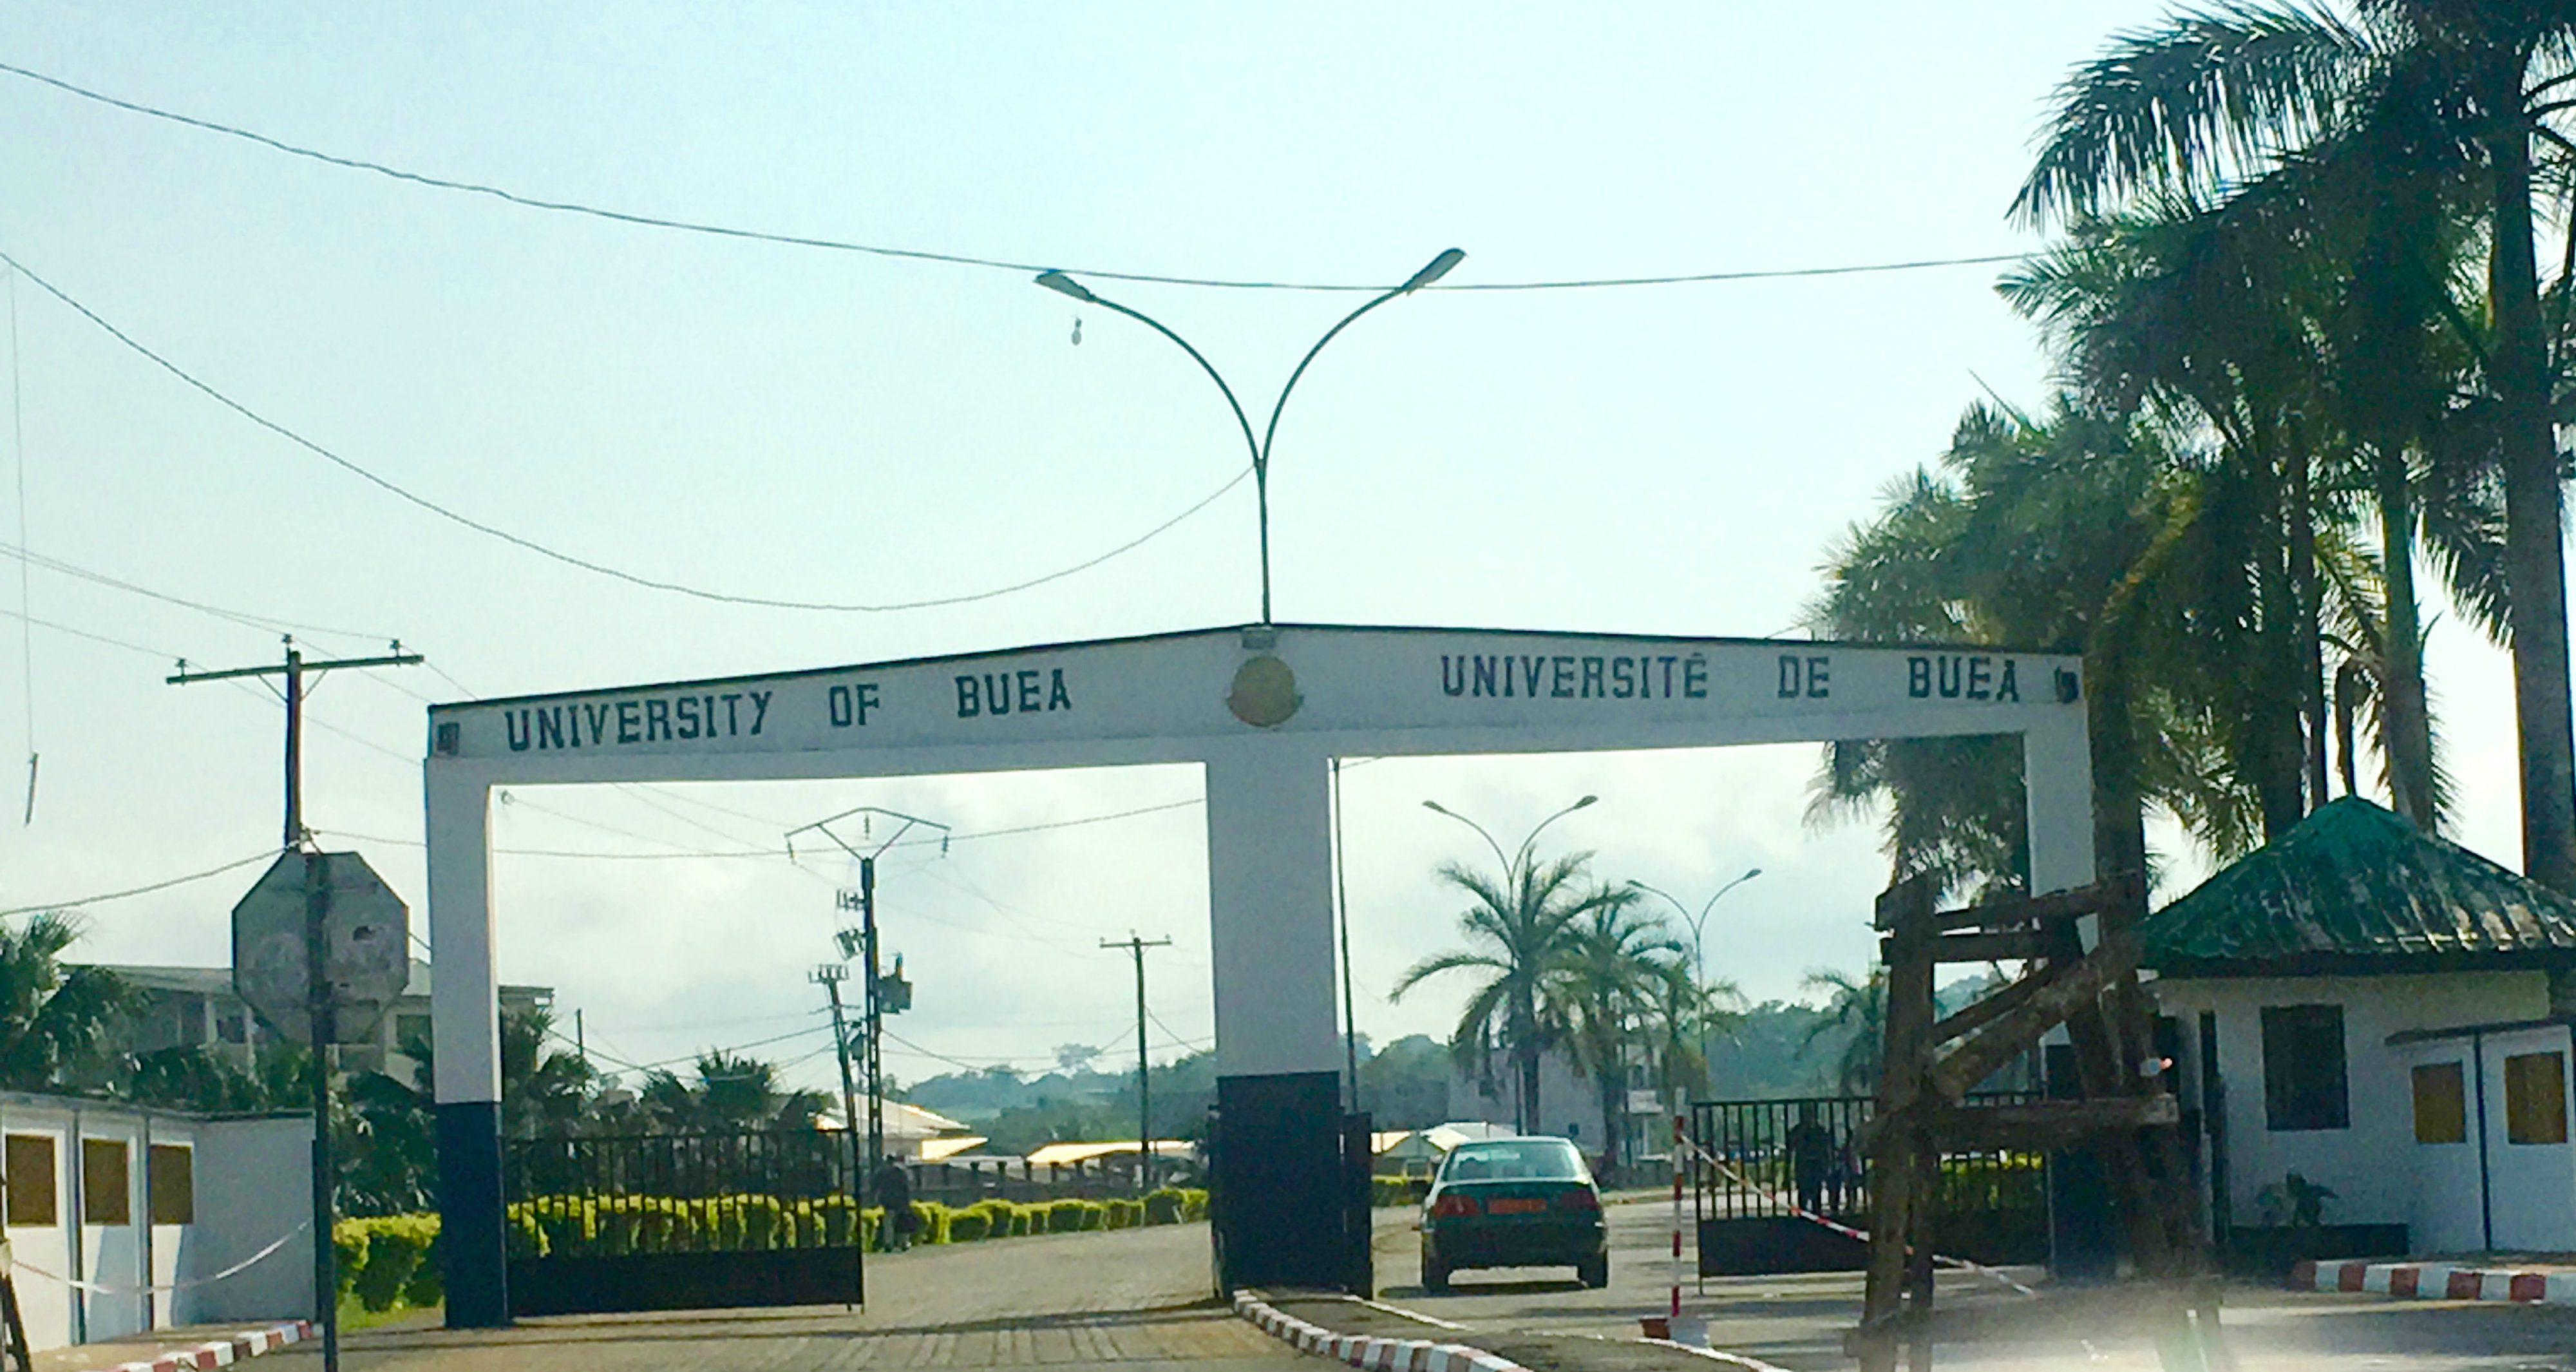 University of Buea in Cameroon's southwest English speaking region.